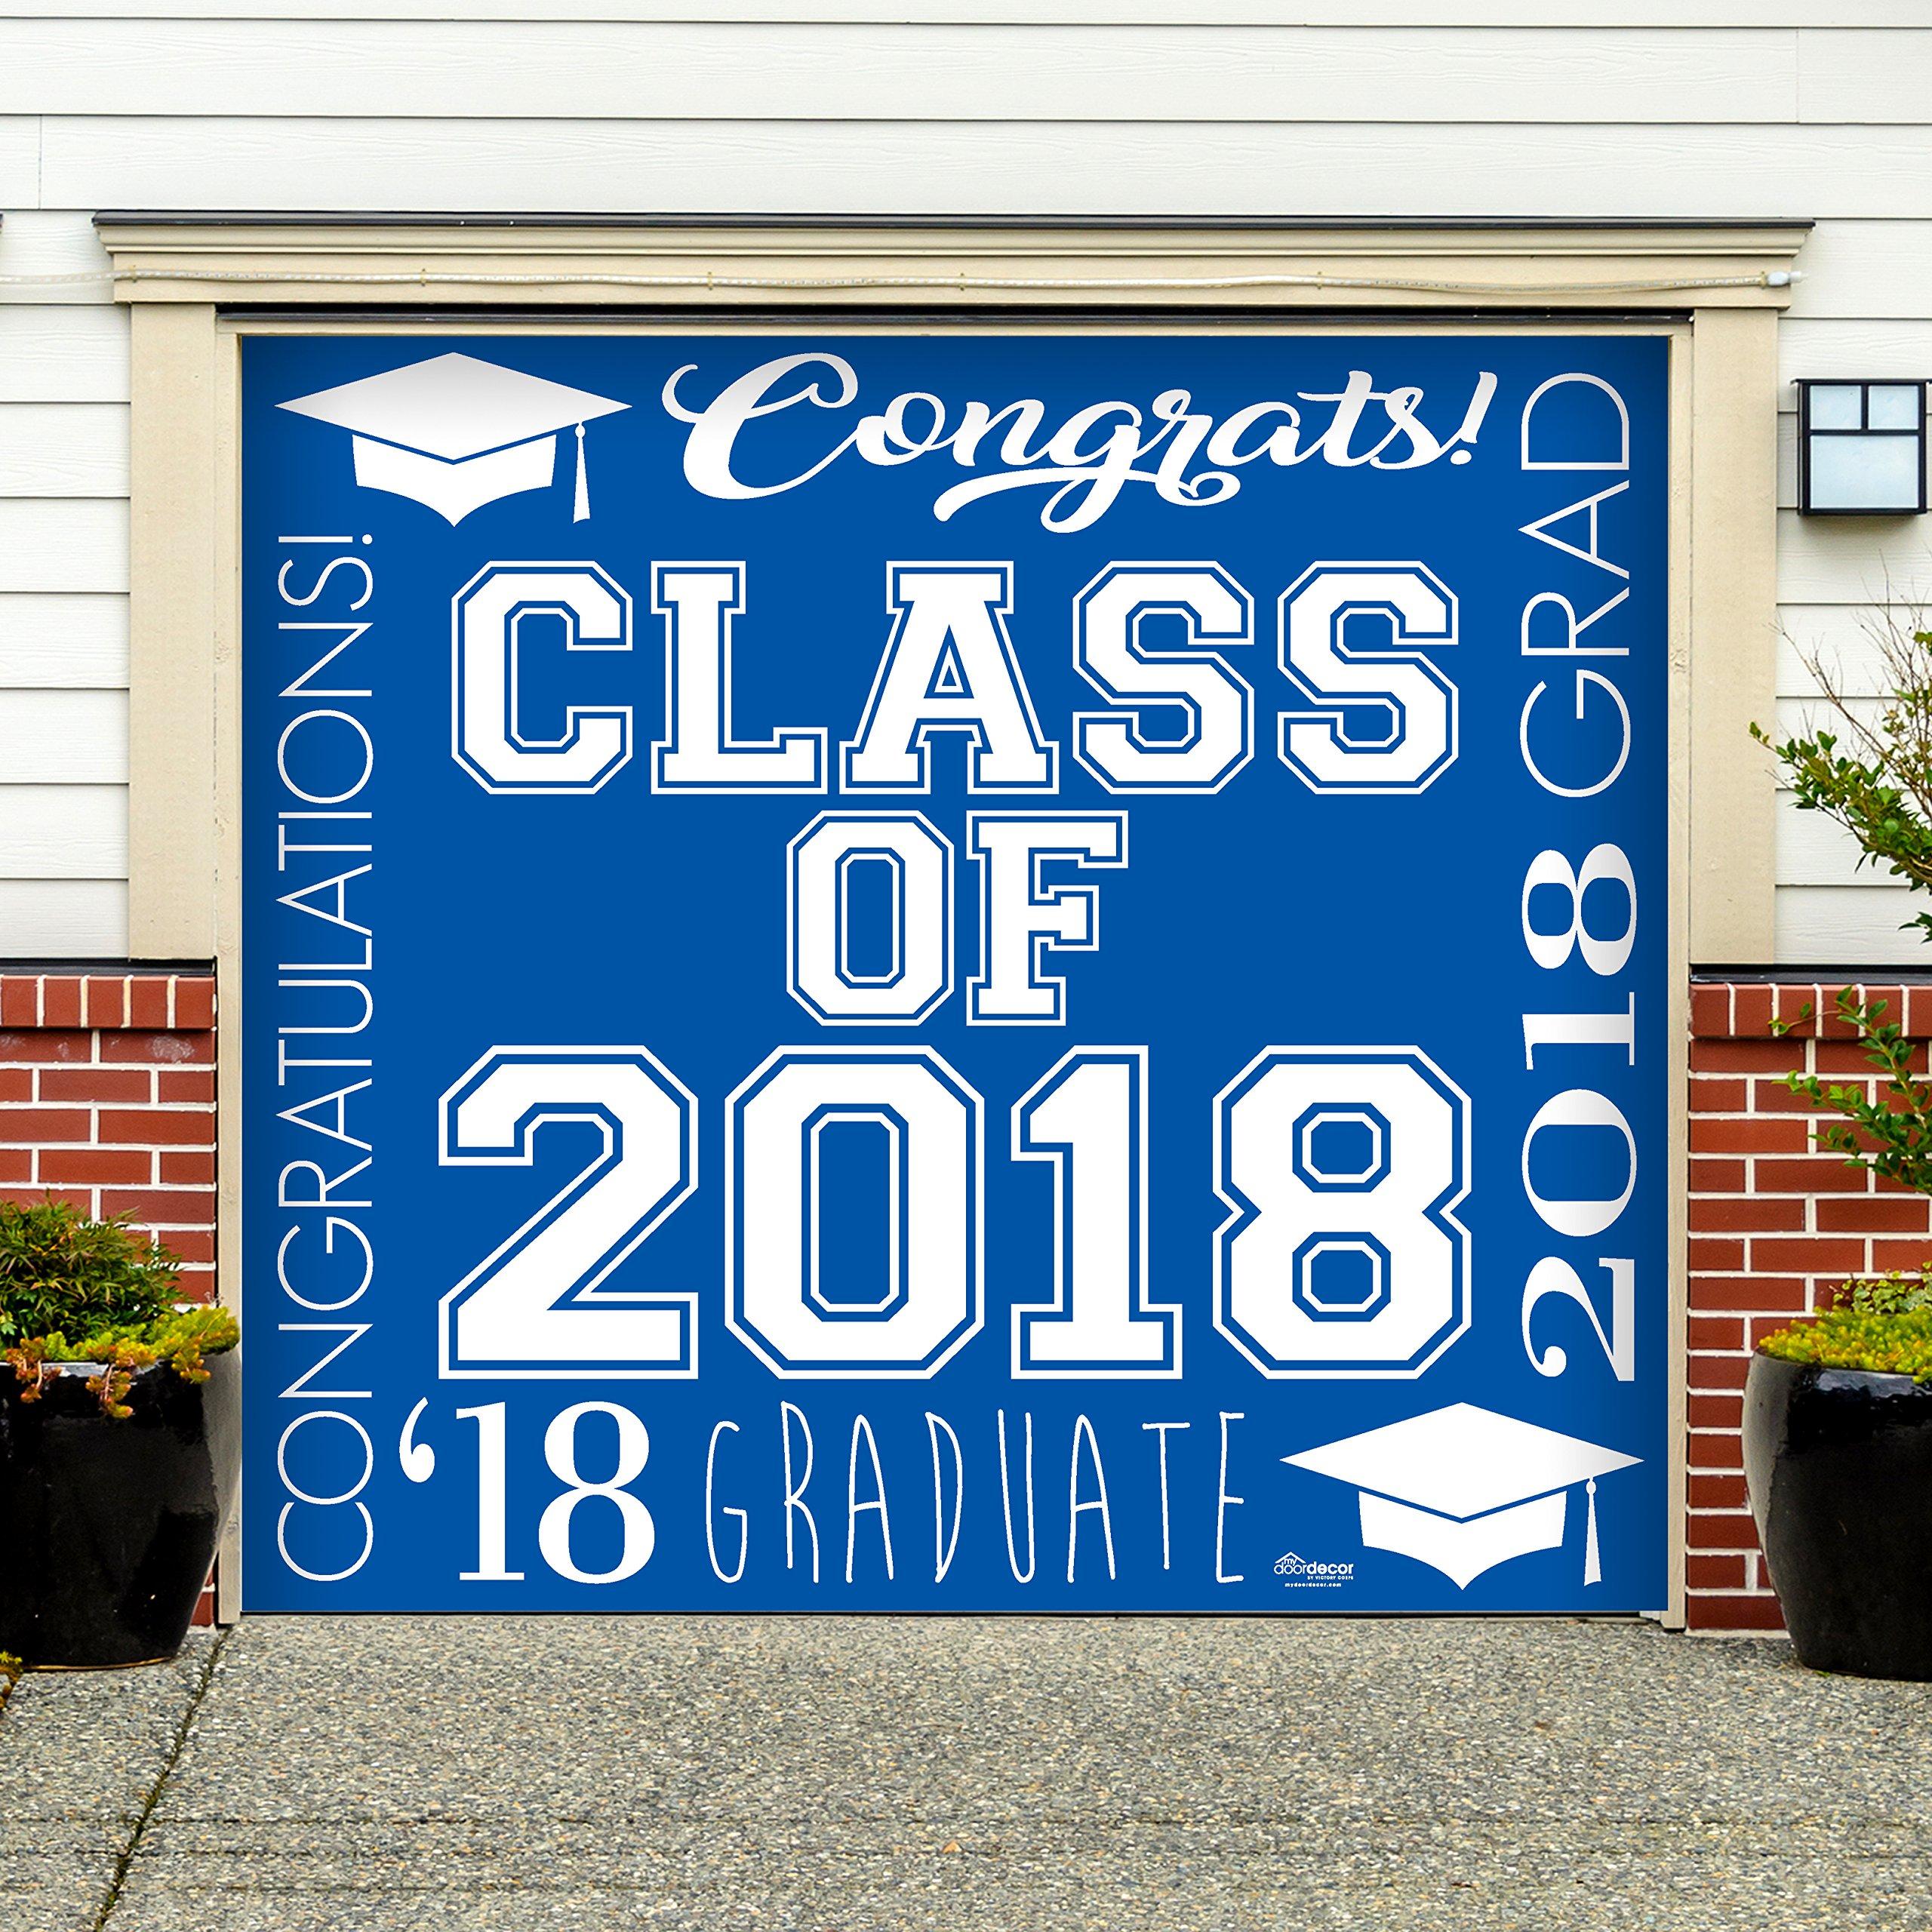 Victory Corps Collage Blue - Outdoor Graduation Garage Door Banner Mural Sign Décor 7'x 8' Car Garage - The Original Holiday Garage Door Banner Decor